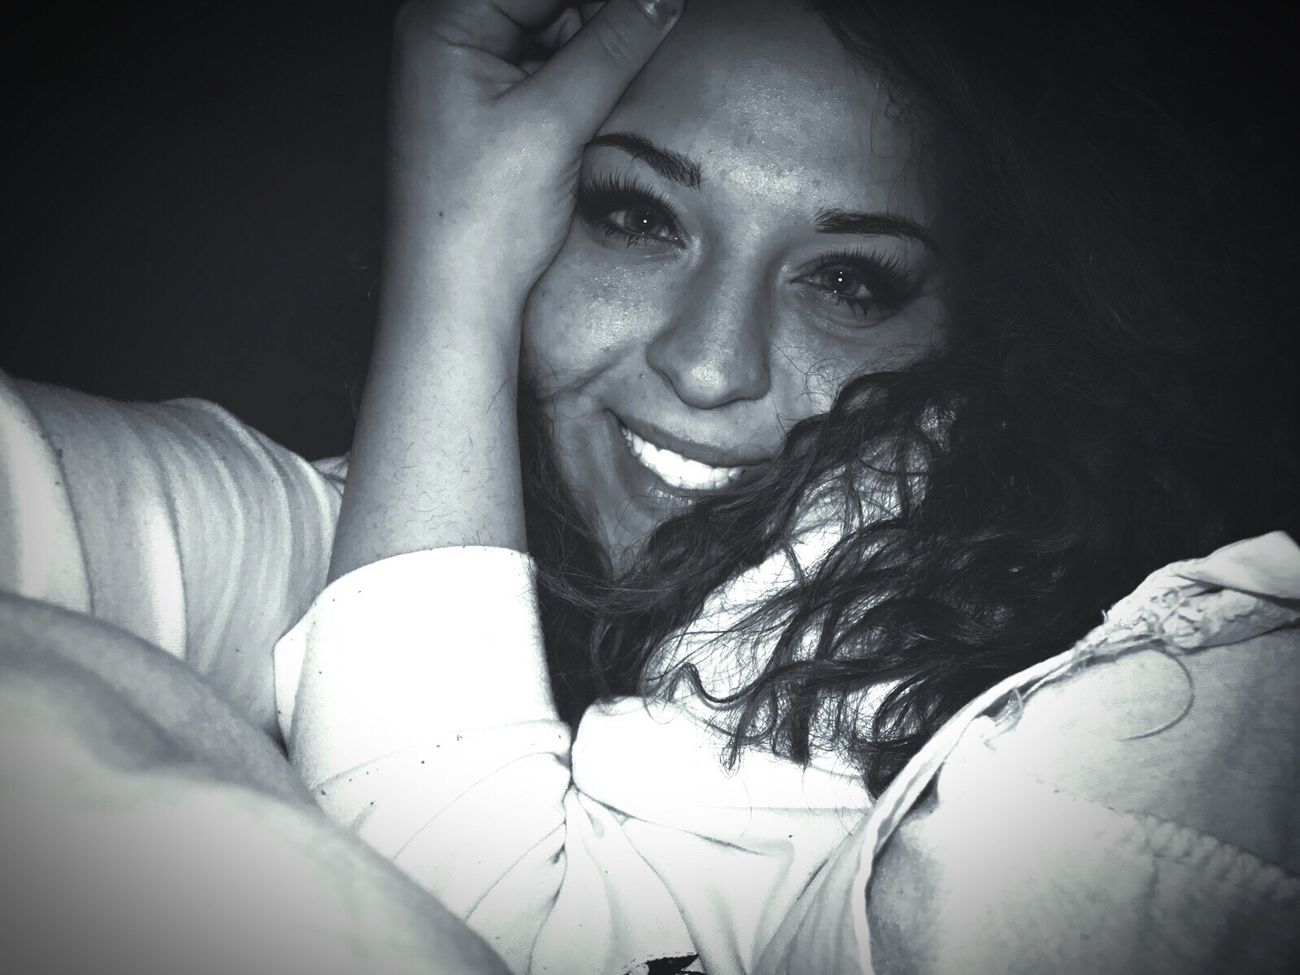 Goodnight...😘😴 Me Girl Happy ❄️ Snow Italy❤️ OcchiettiBelli Smile❤ Freddo Polare!😆 LettoFinalmente✌🏼 Buenas Noches! ❤ Goodnight EyeEm ♥  GoodNight ❤✌ Instafollow Napoliphotoproject